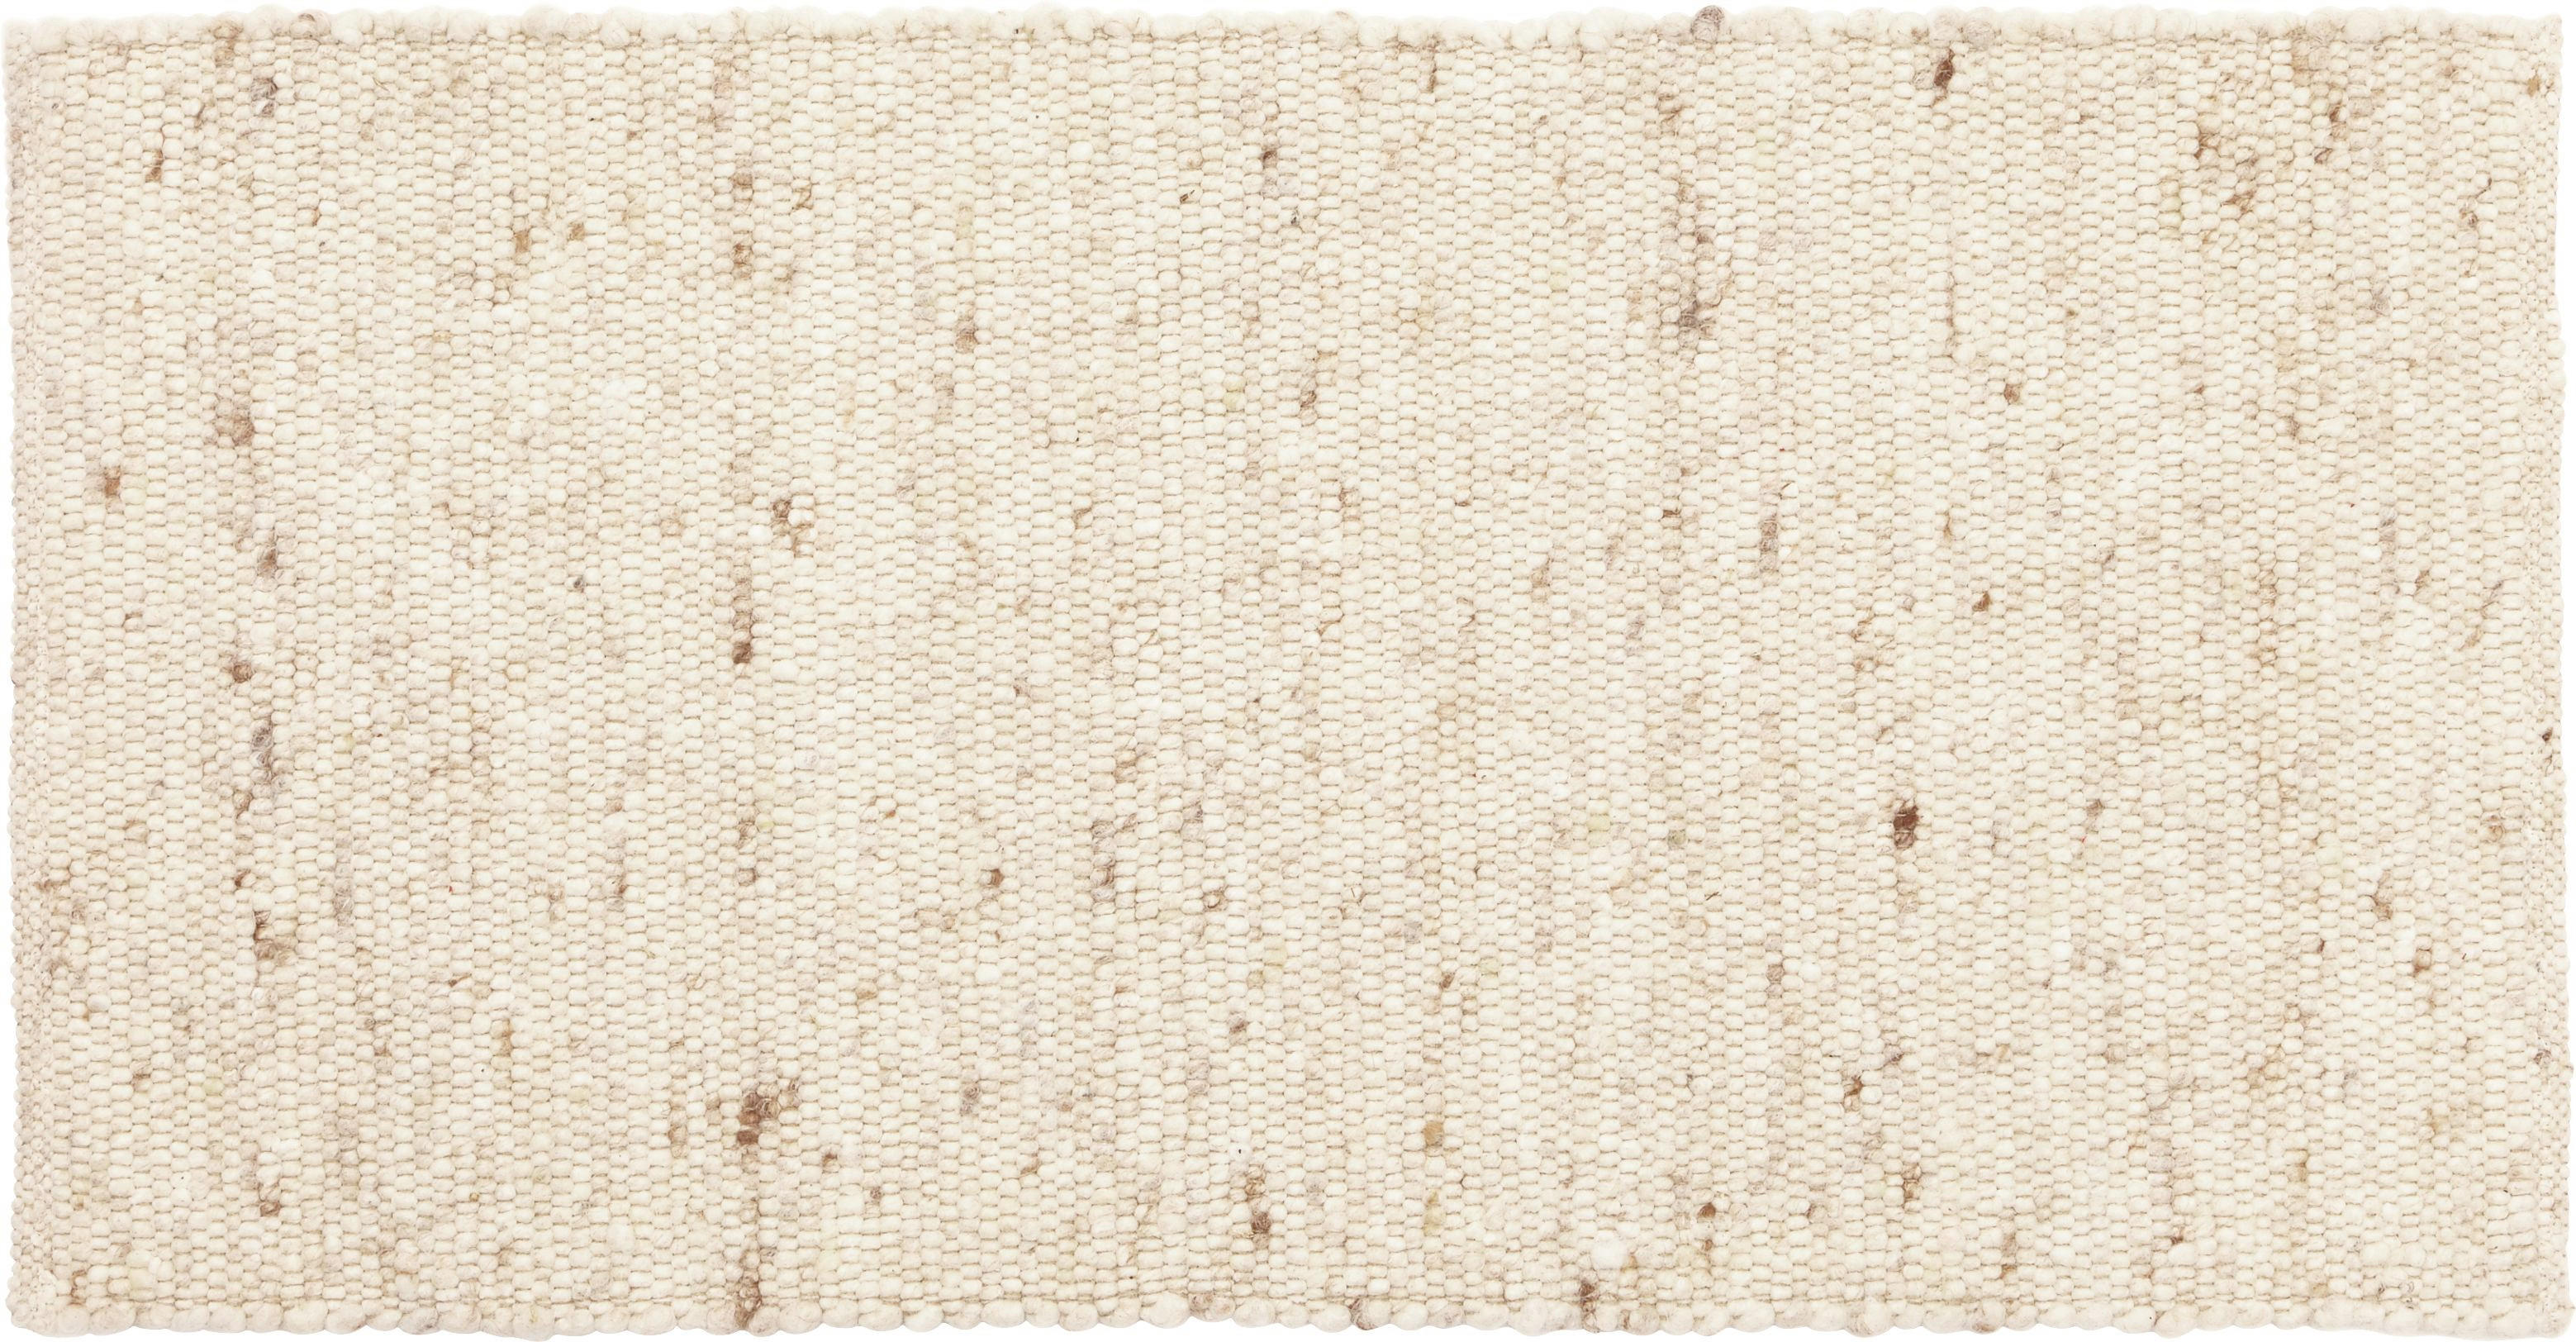 HANDWEBTEPPICH 90/160 cm - Creme, LIFESTYLE, Textil (90/160cm) - LINEA NATURA